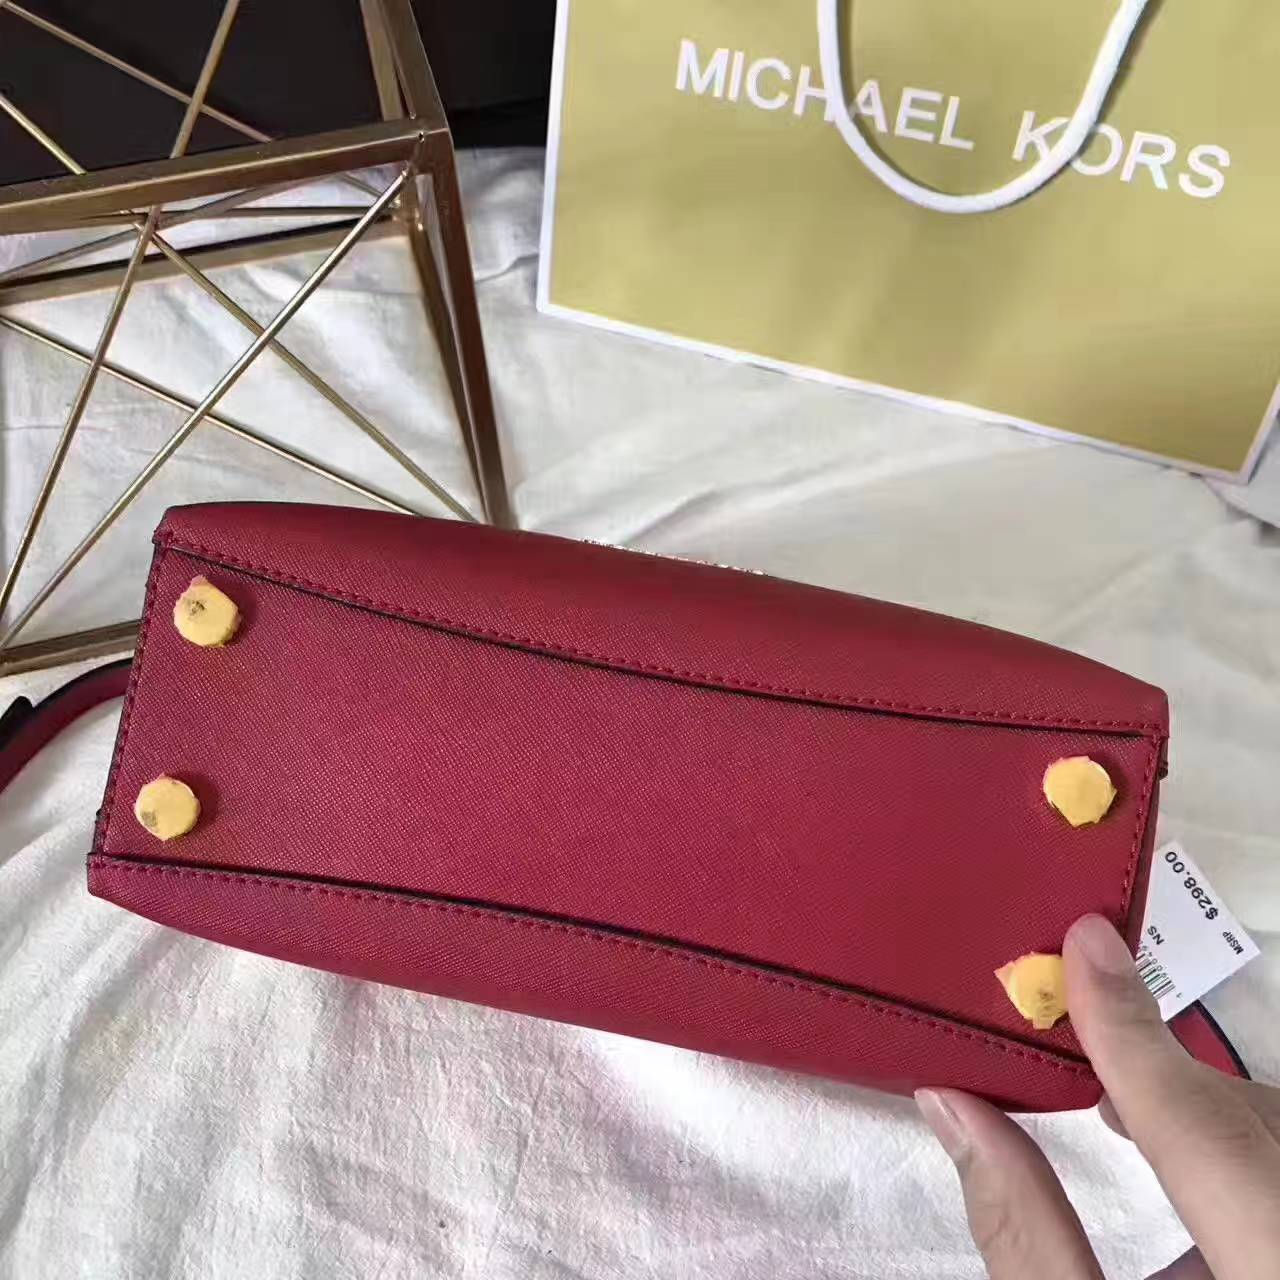 MK包包批发 迈克科尔斯十字纹牛皮玉石单肩包斜挎女包 红色